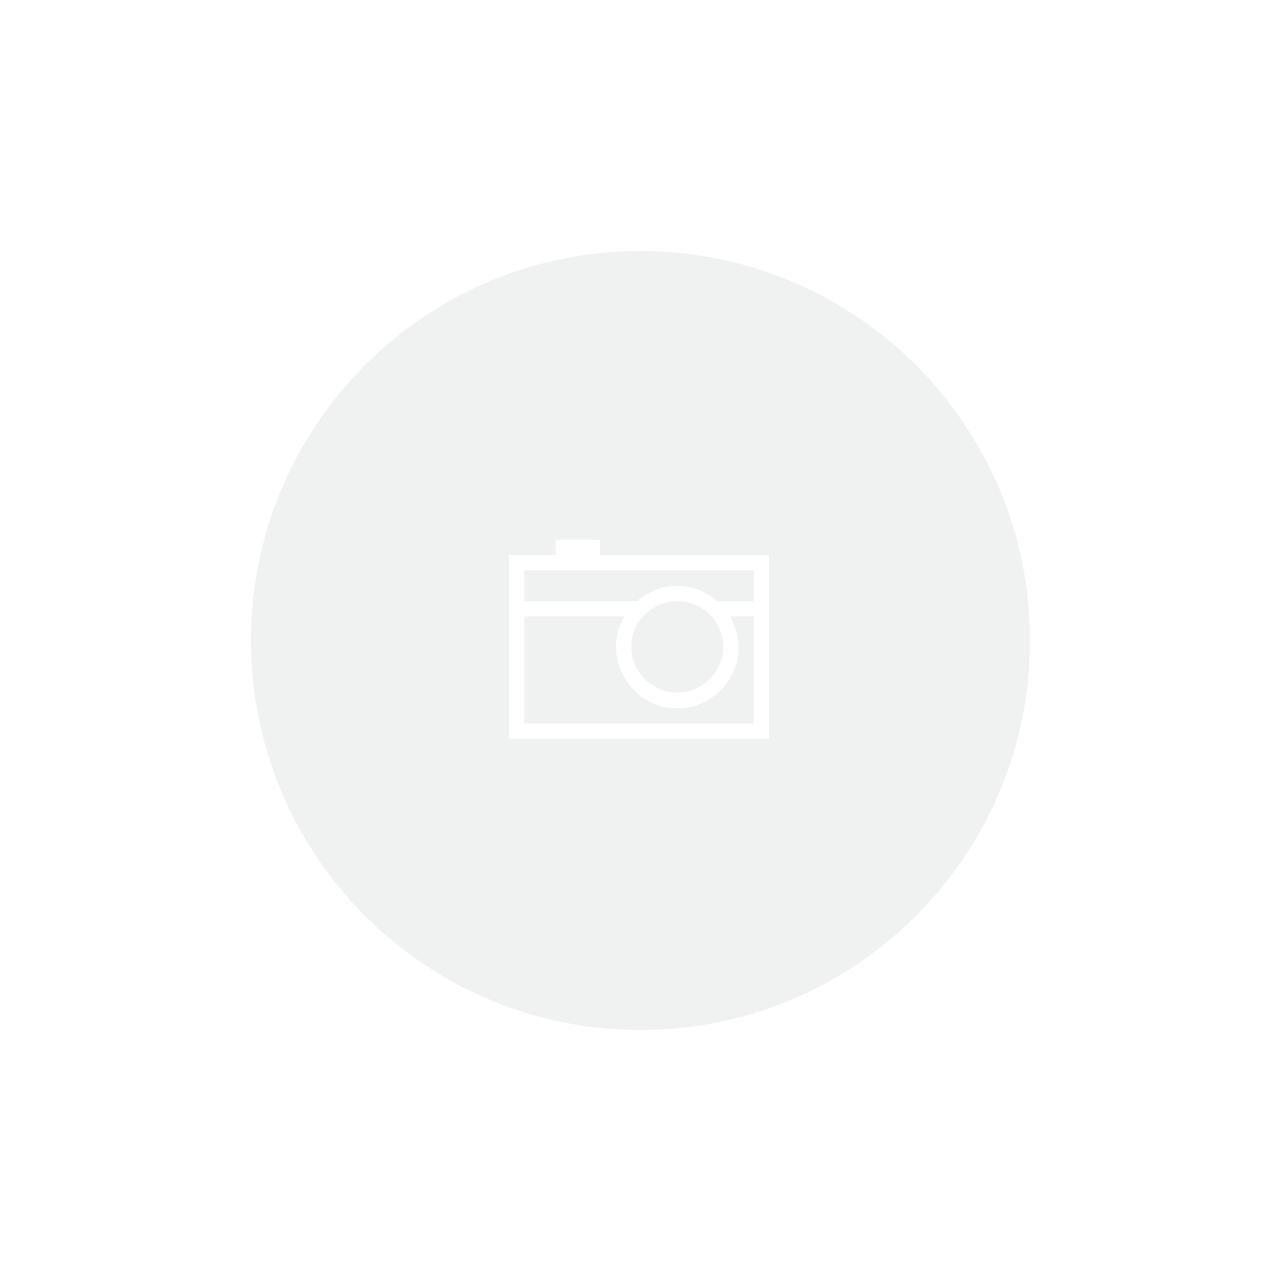 gola-de-tricot-peluda-069if16